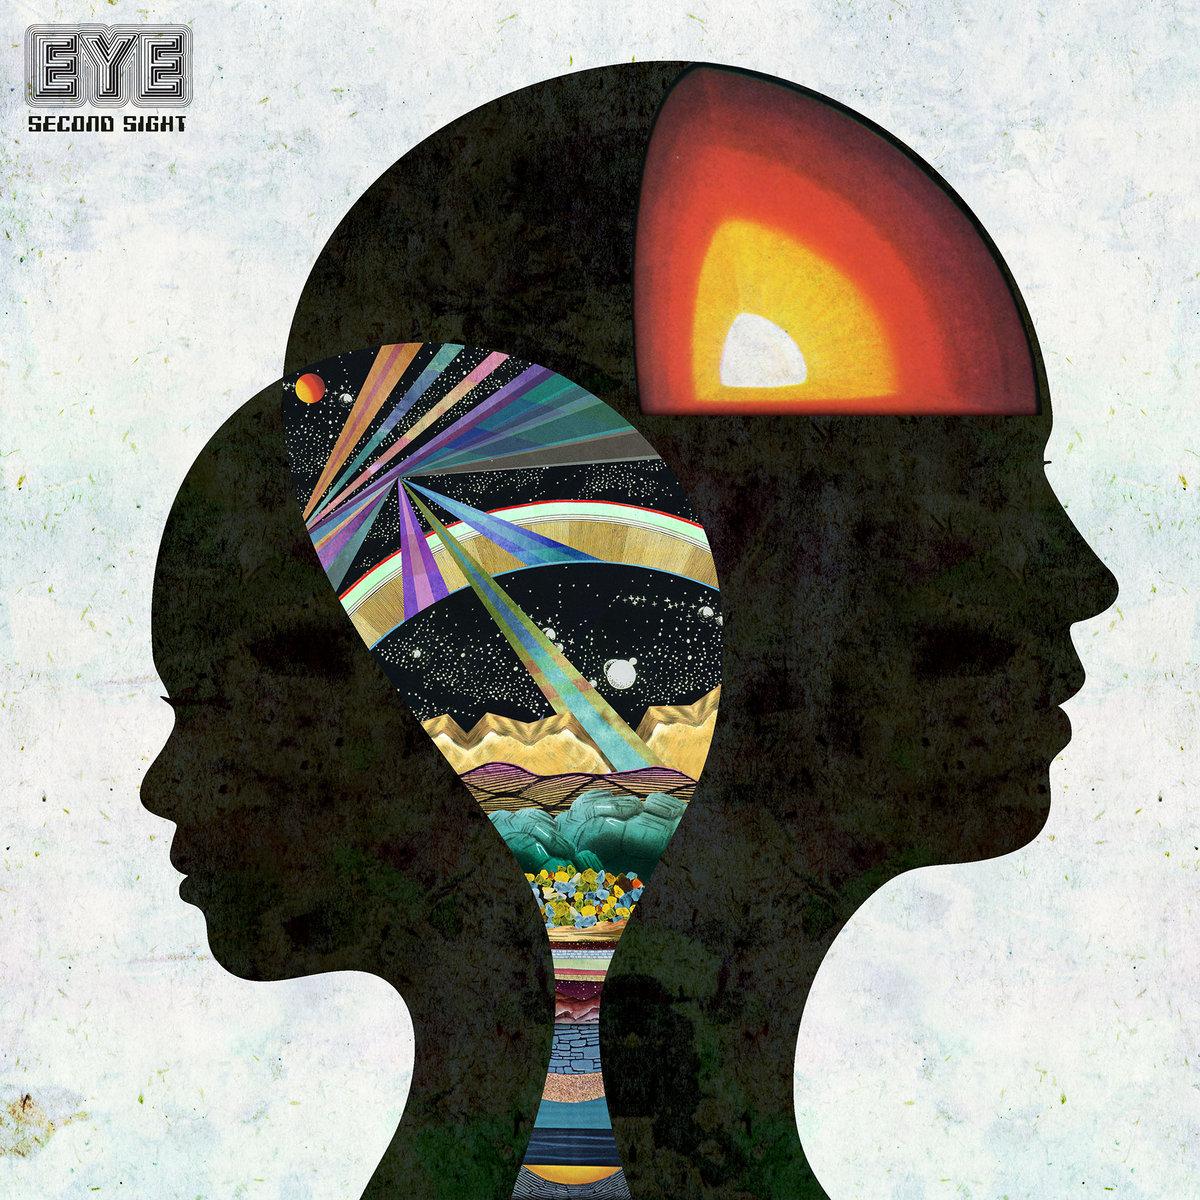 Eye — Second Sight